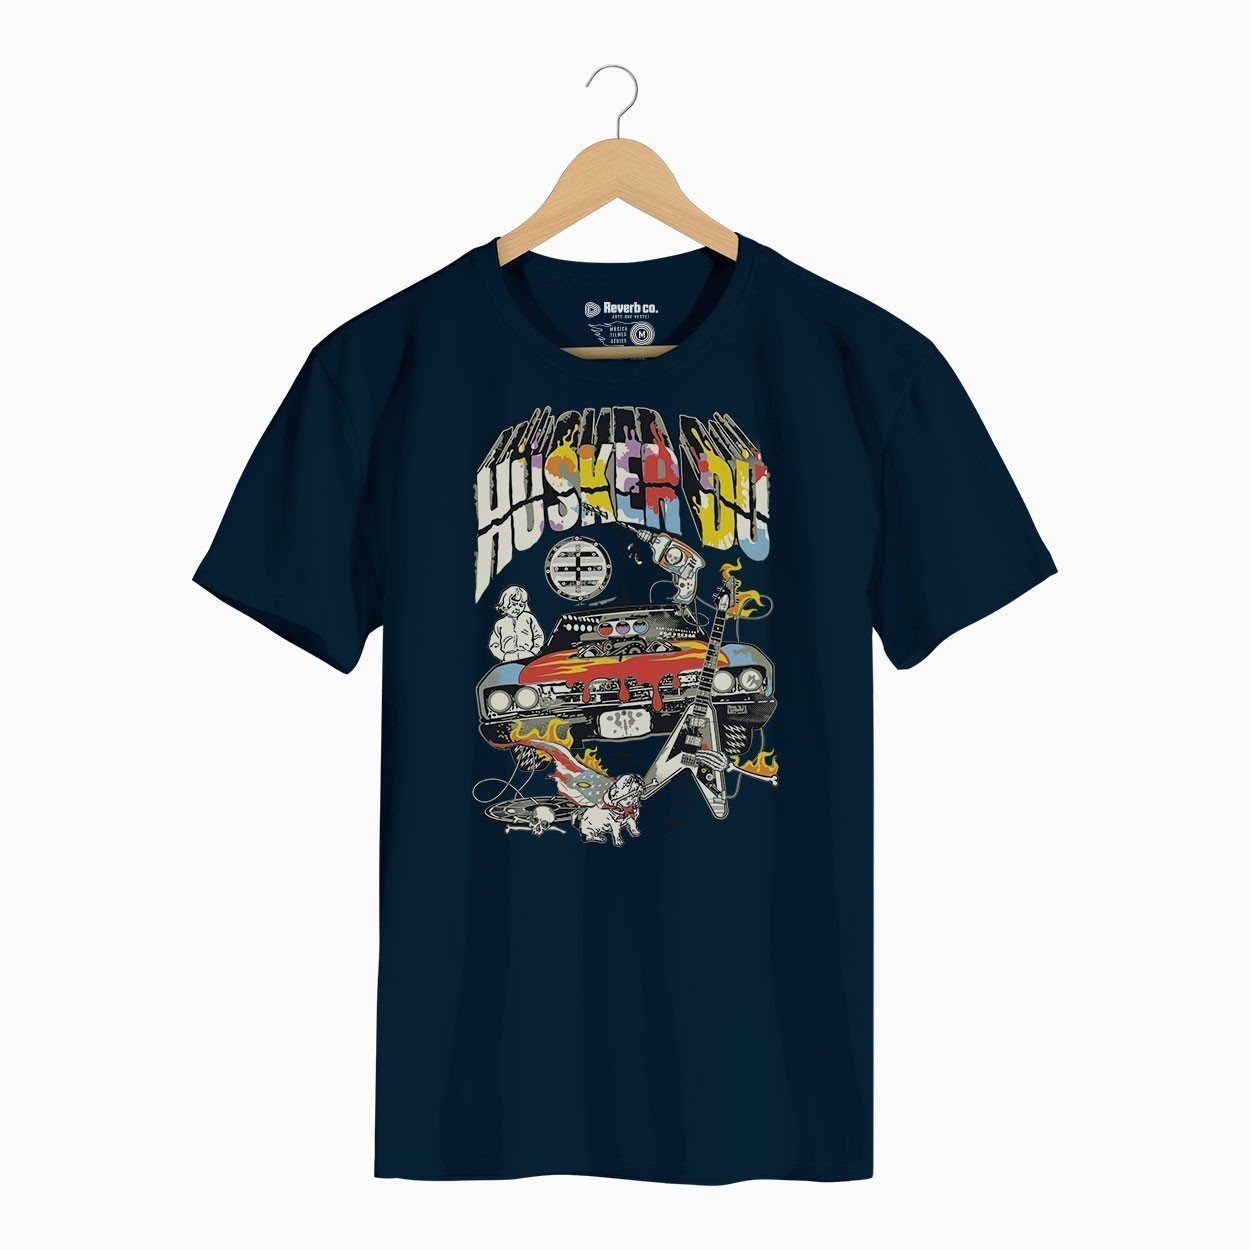 Camiseta Husker Du - Masculino